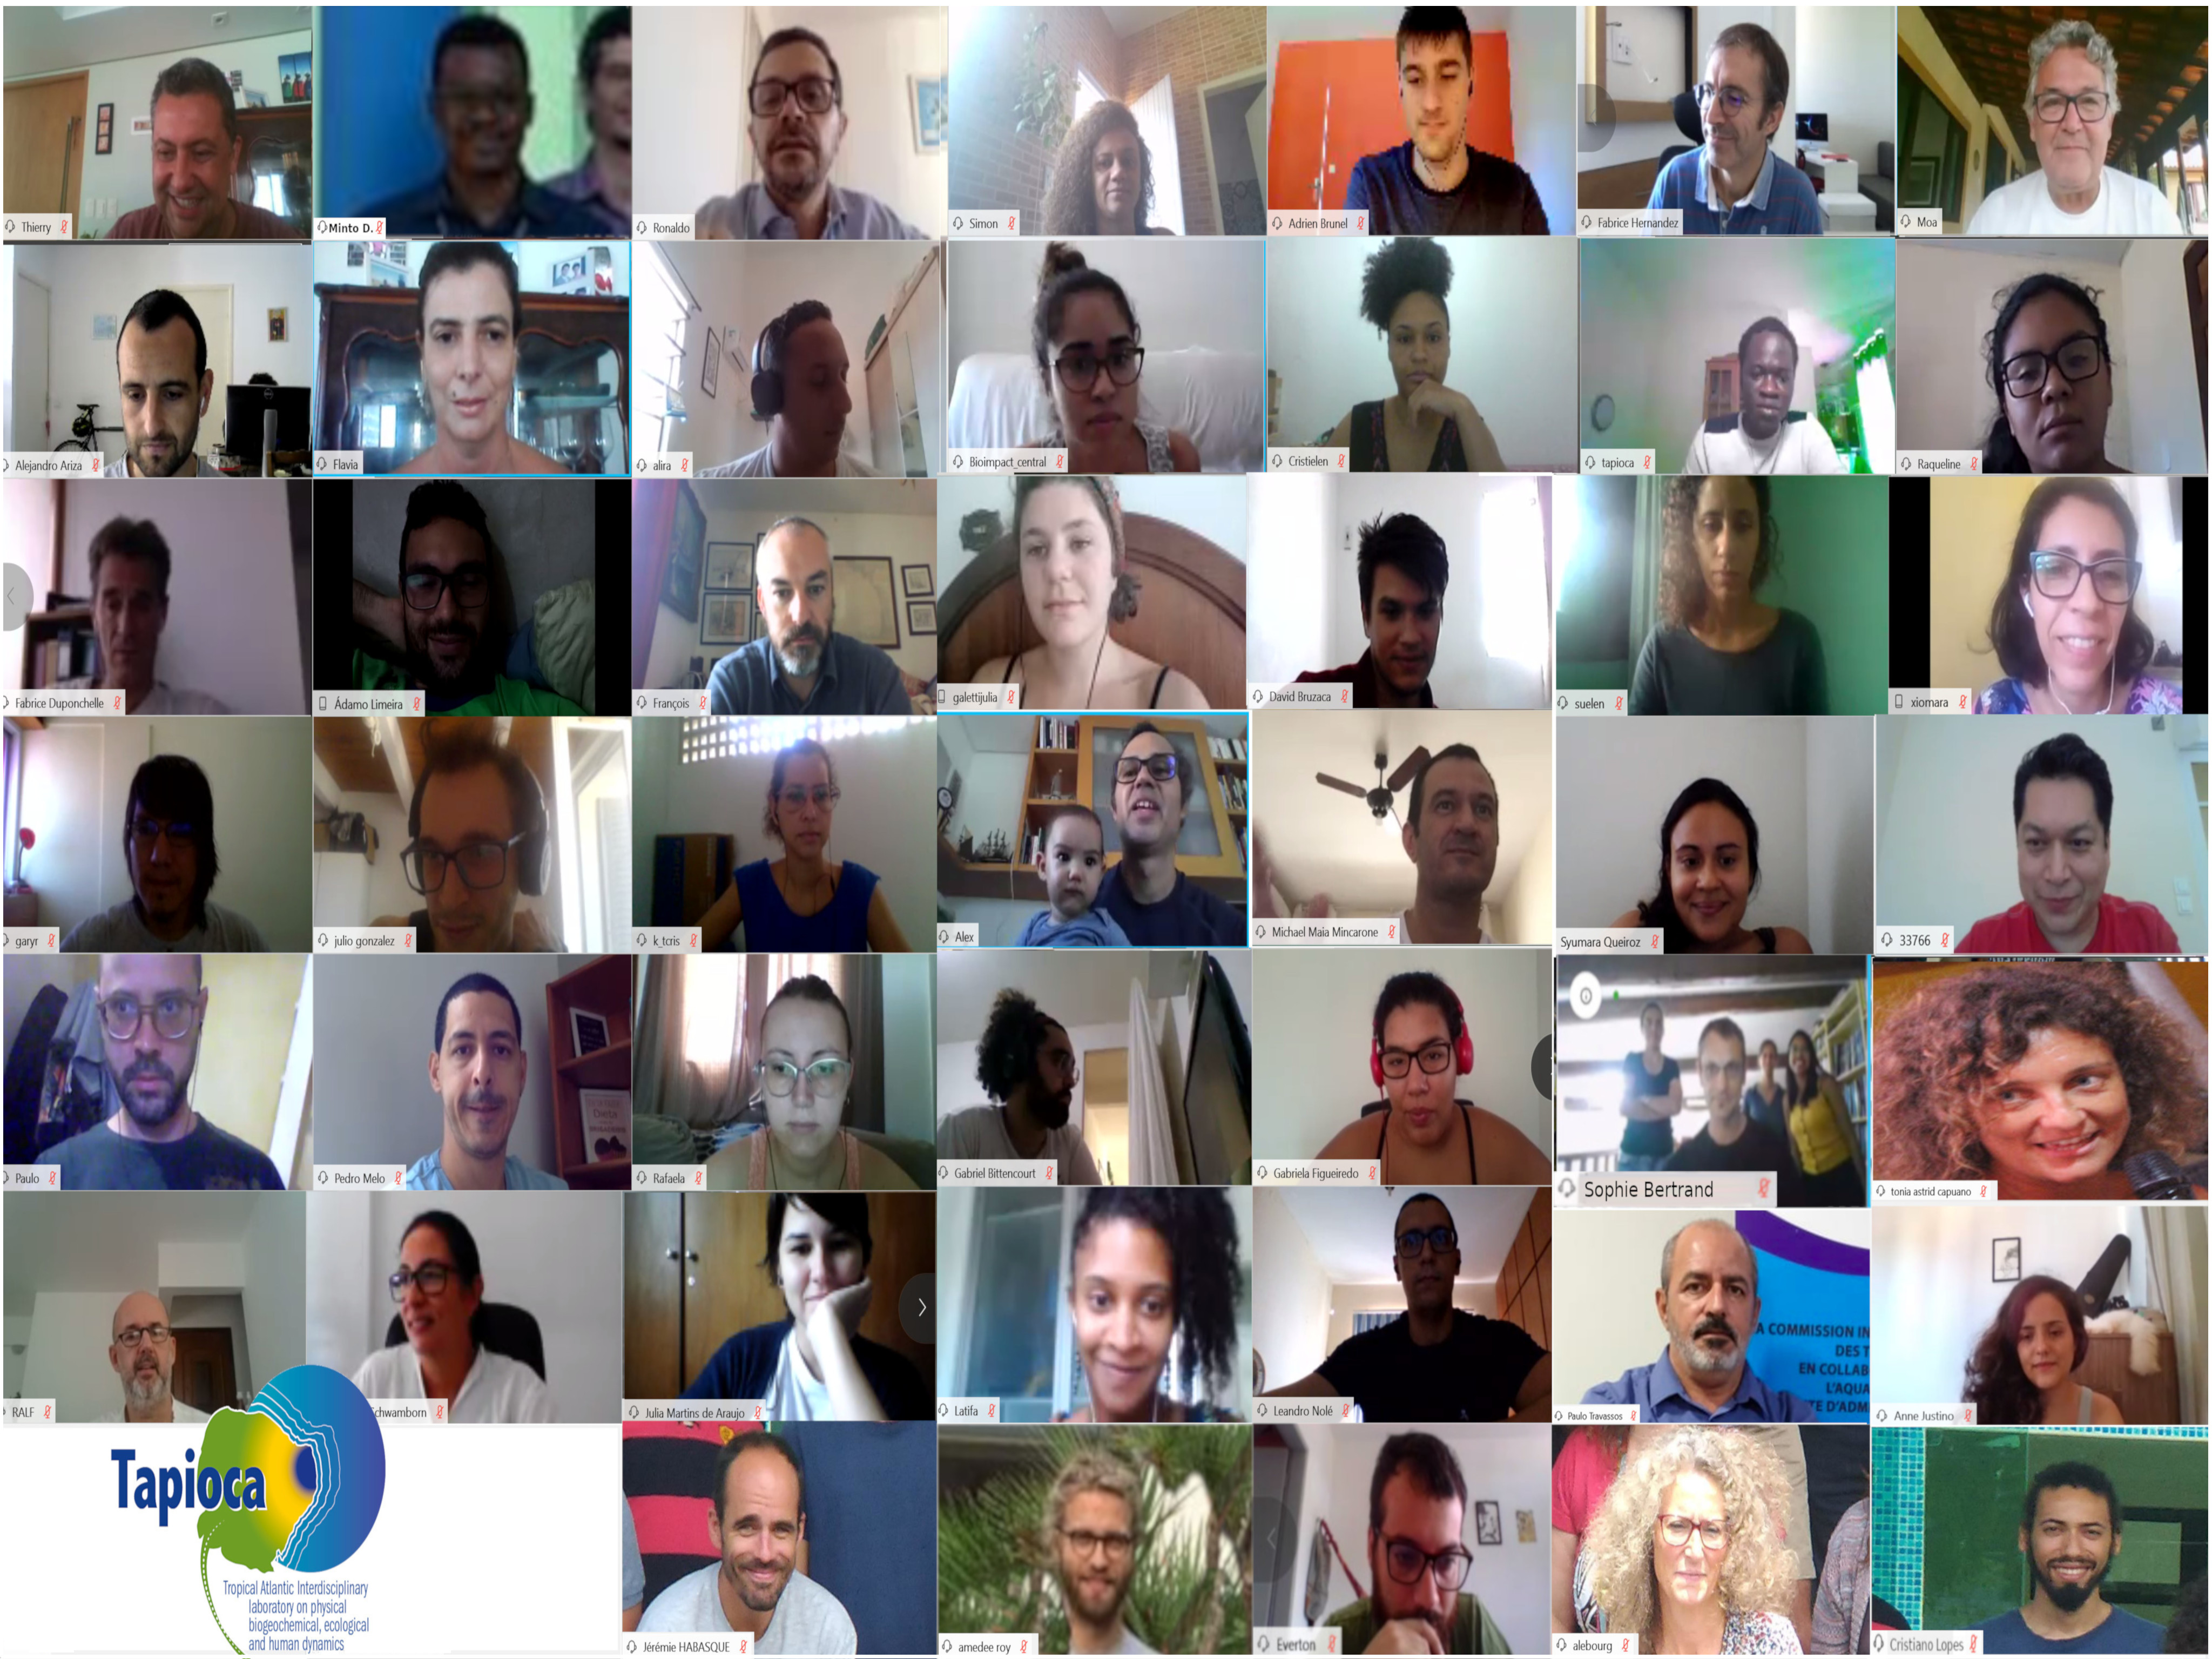 Follow up – last TAPIOCA meeting (05-06/05/2020) – Webex